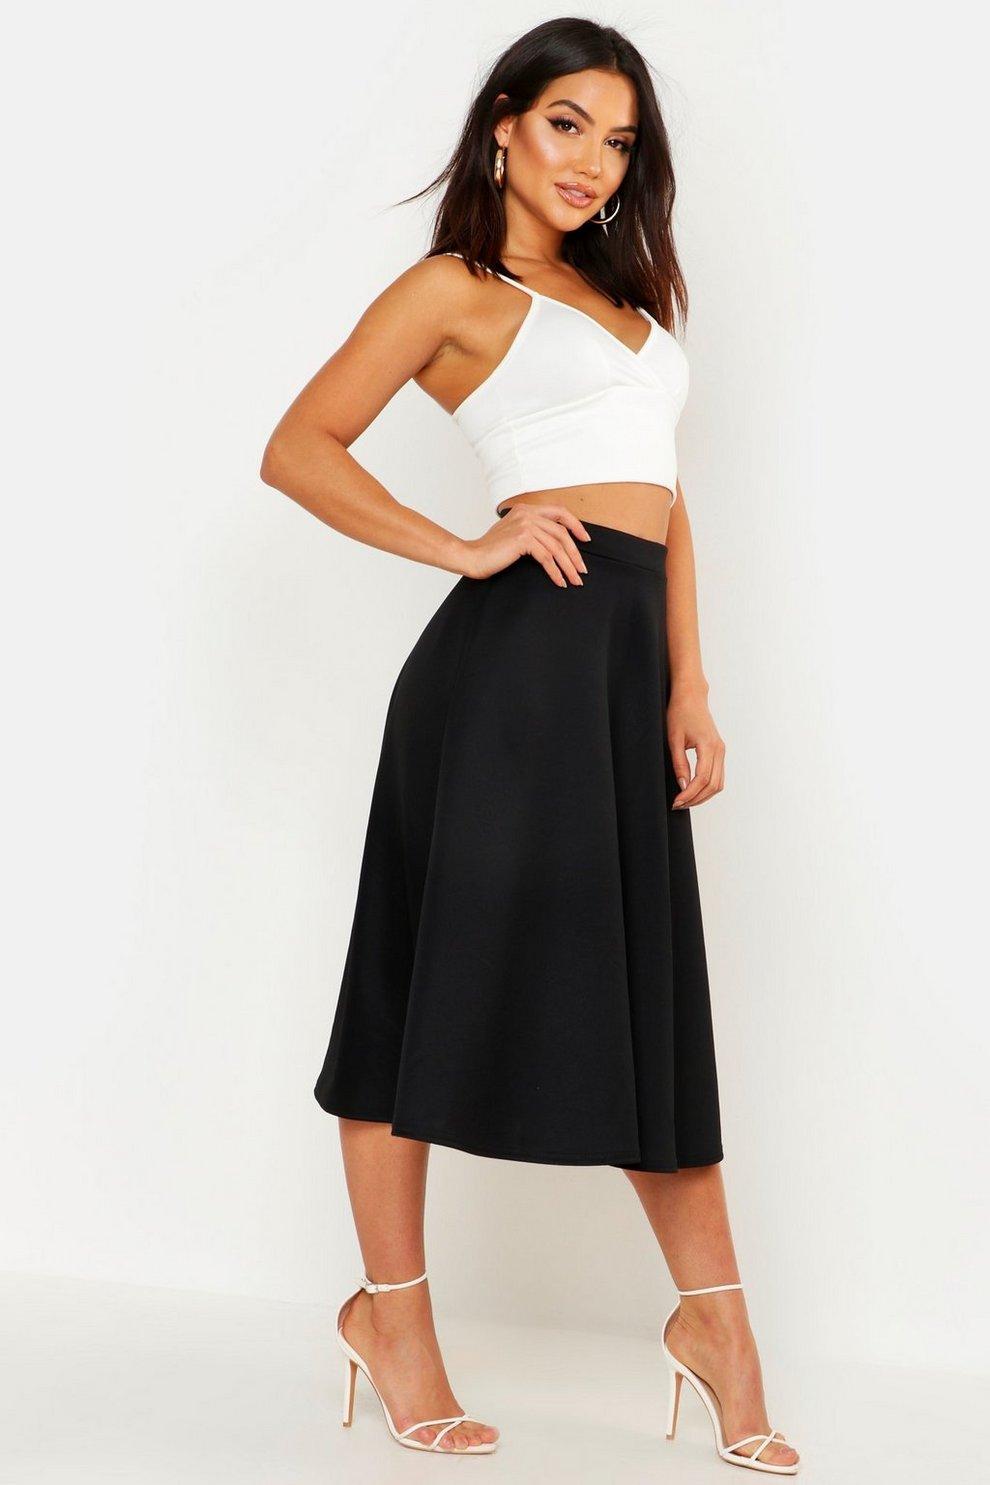 a64a78283f Womens Black Basic Plain Full Circle Midi Skirt